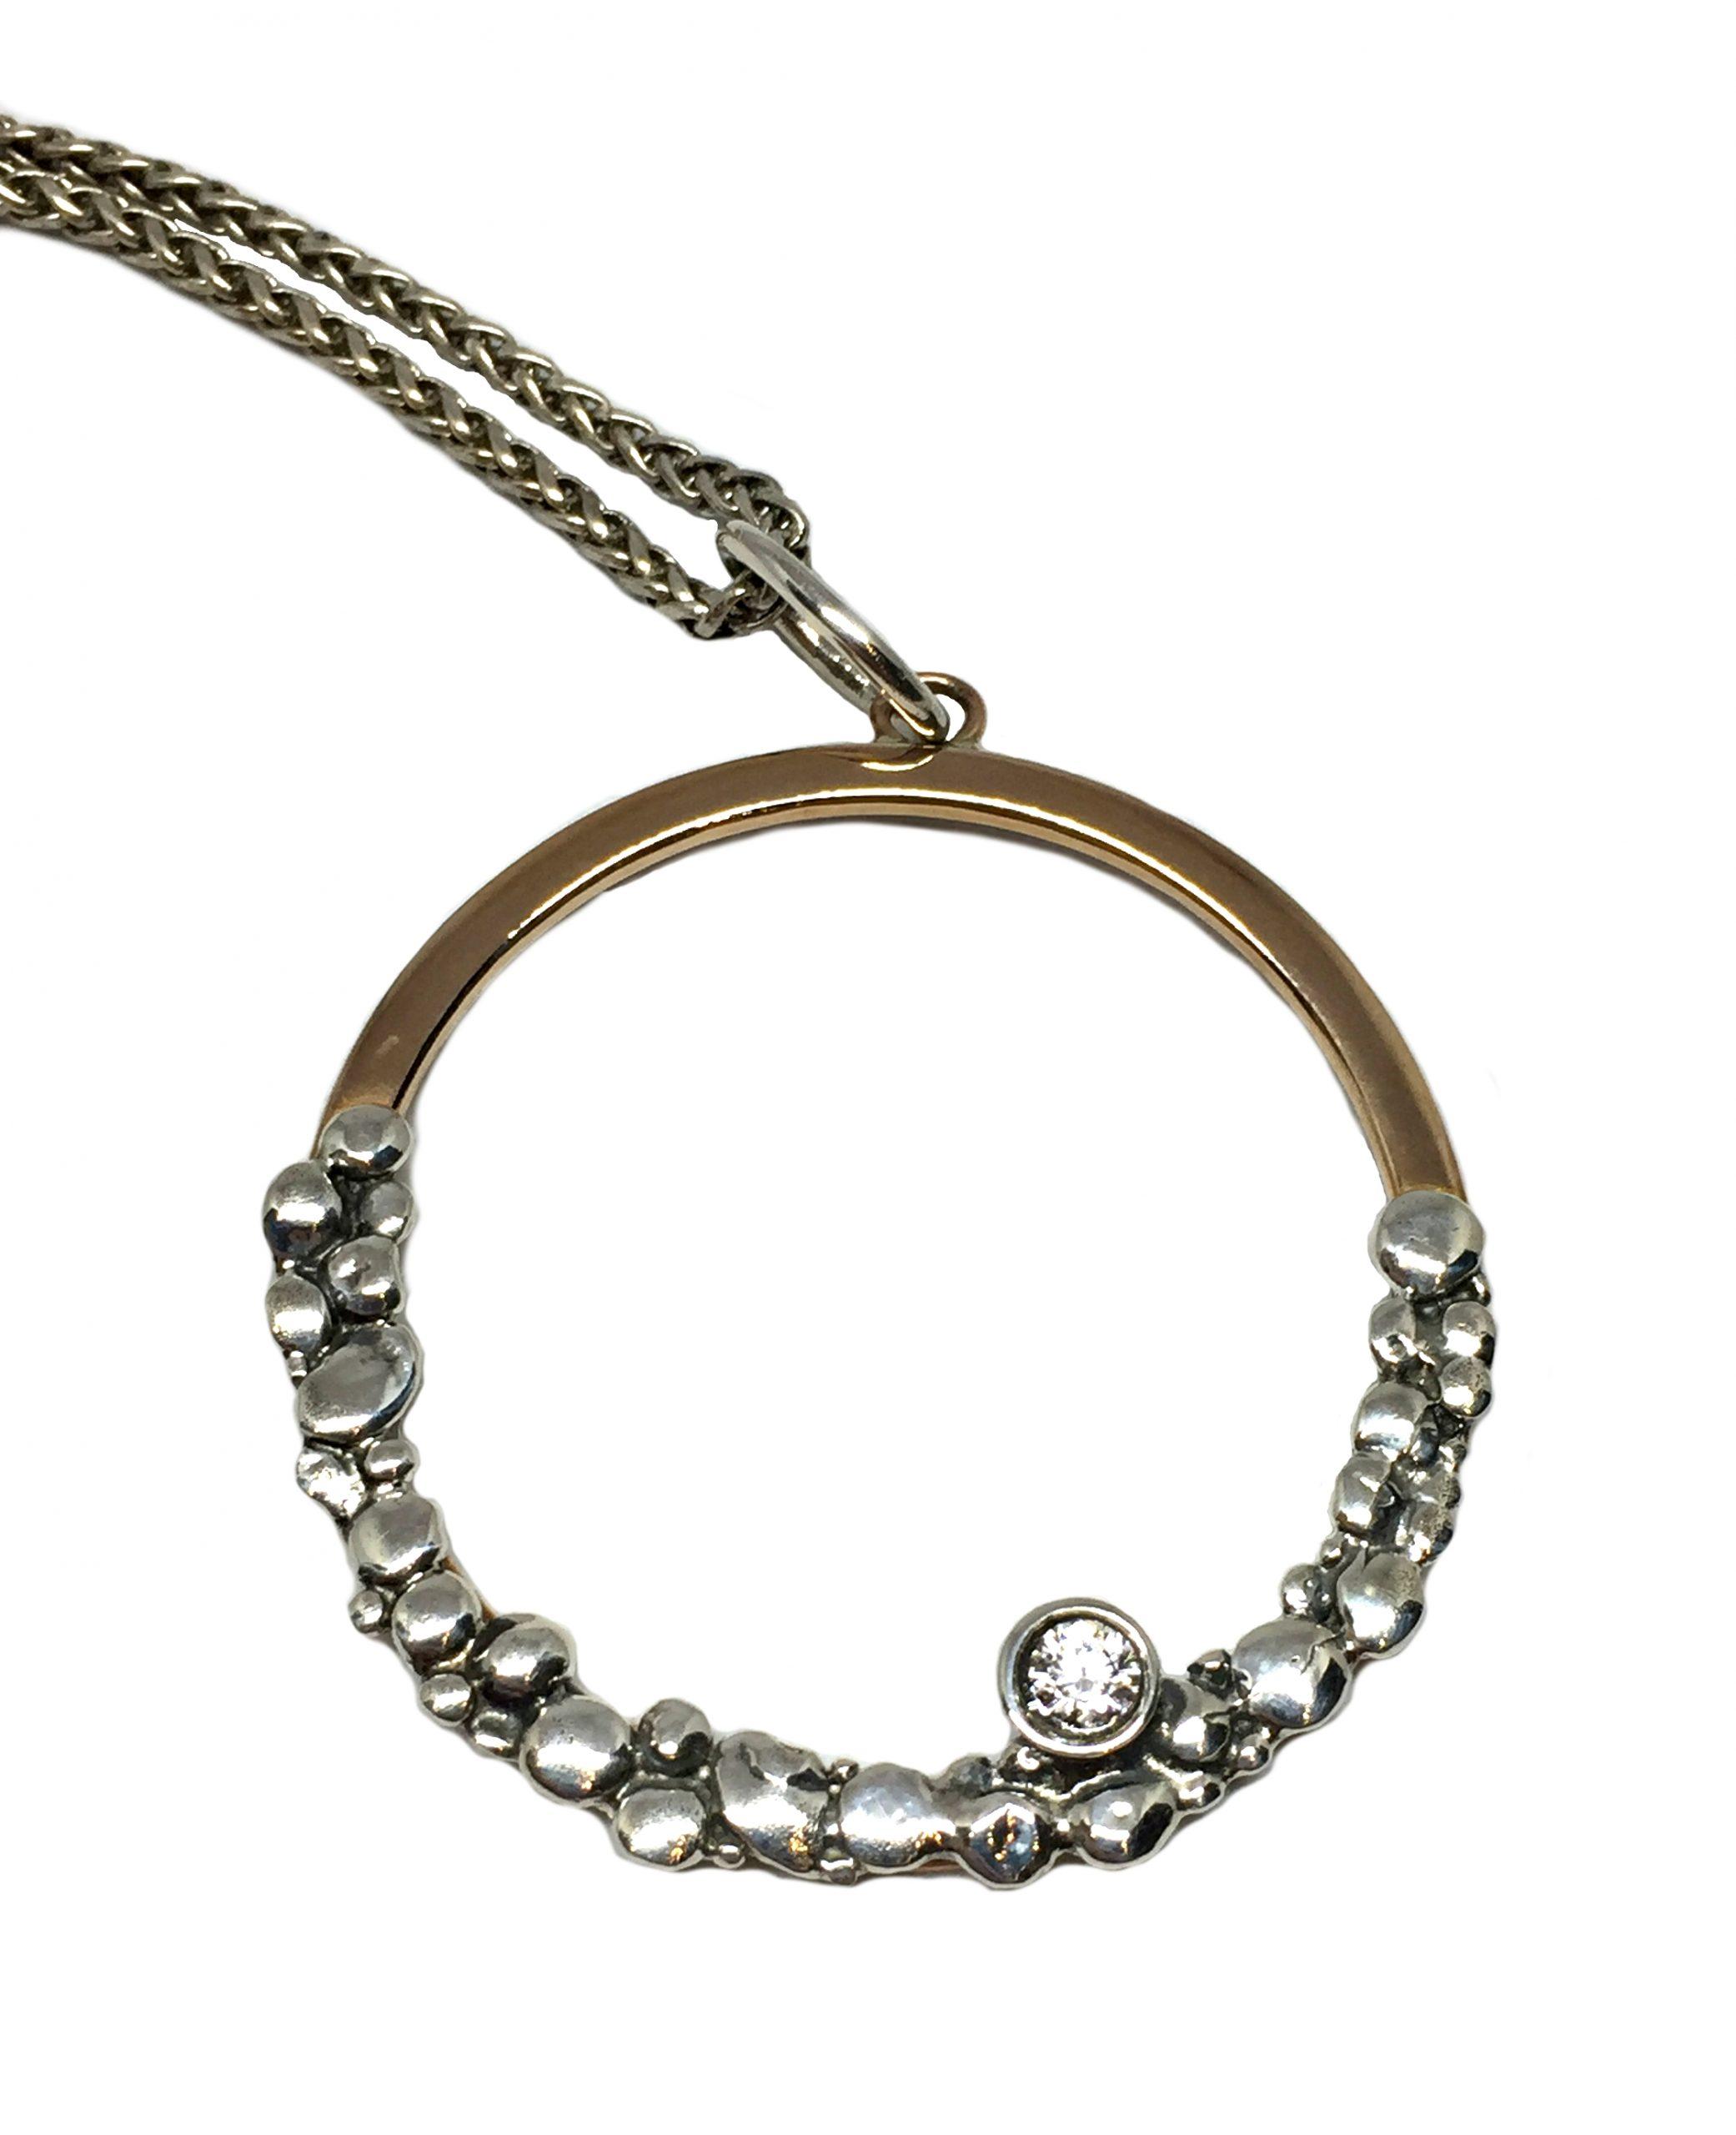 Sterling silver, bronze, + CZ pendant by Karyn Chopik | Effusion Art gallery + Cast Glass Studio, Invermere BC